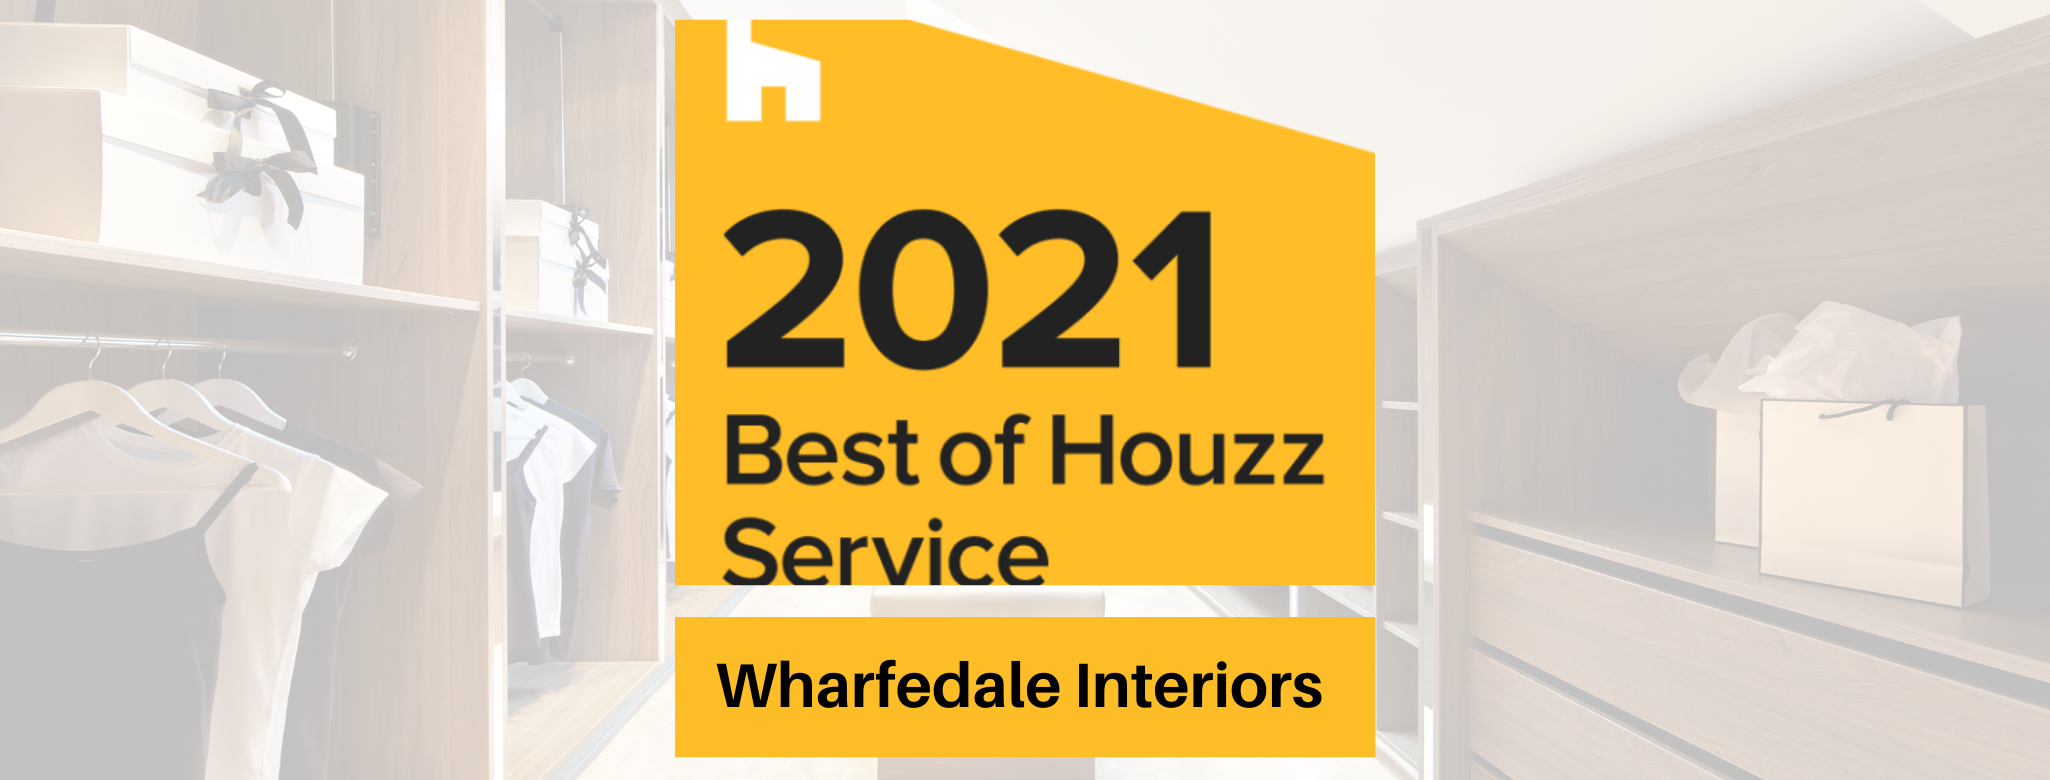 Wharfedale Interiors wins national award